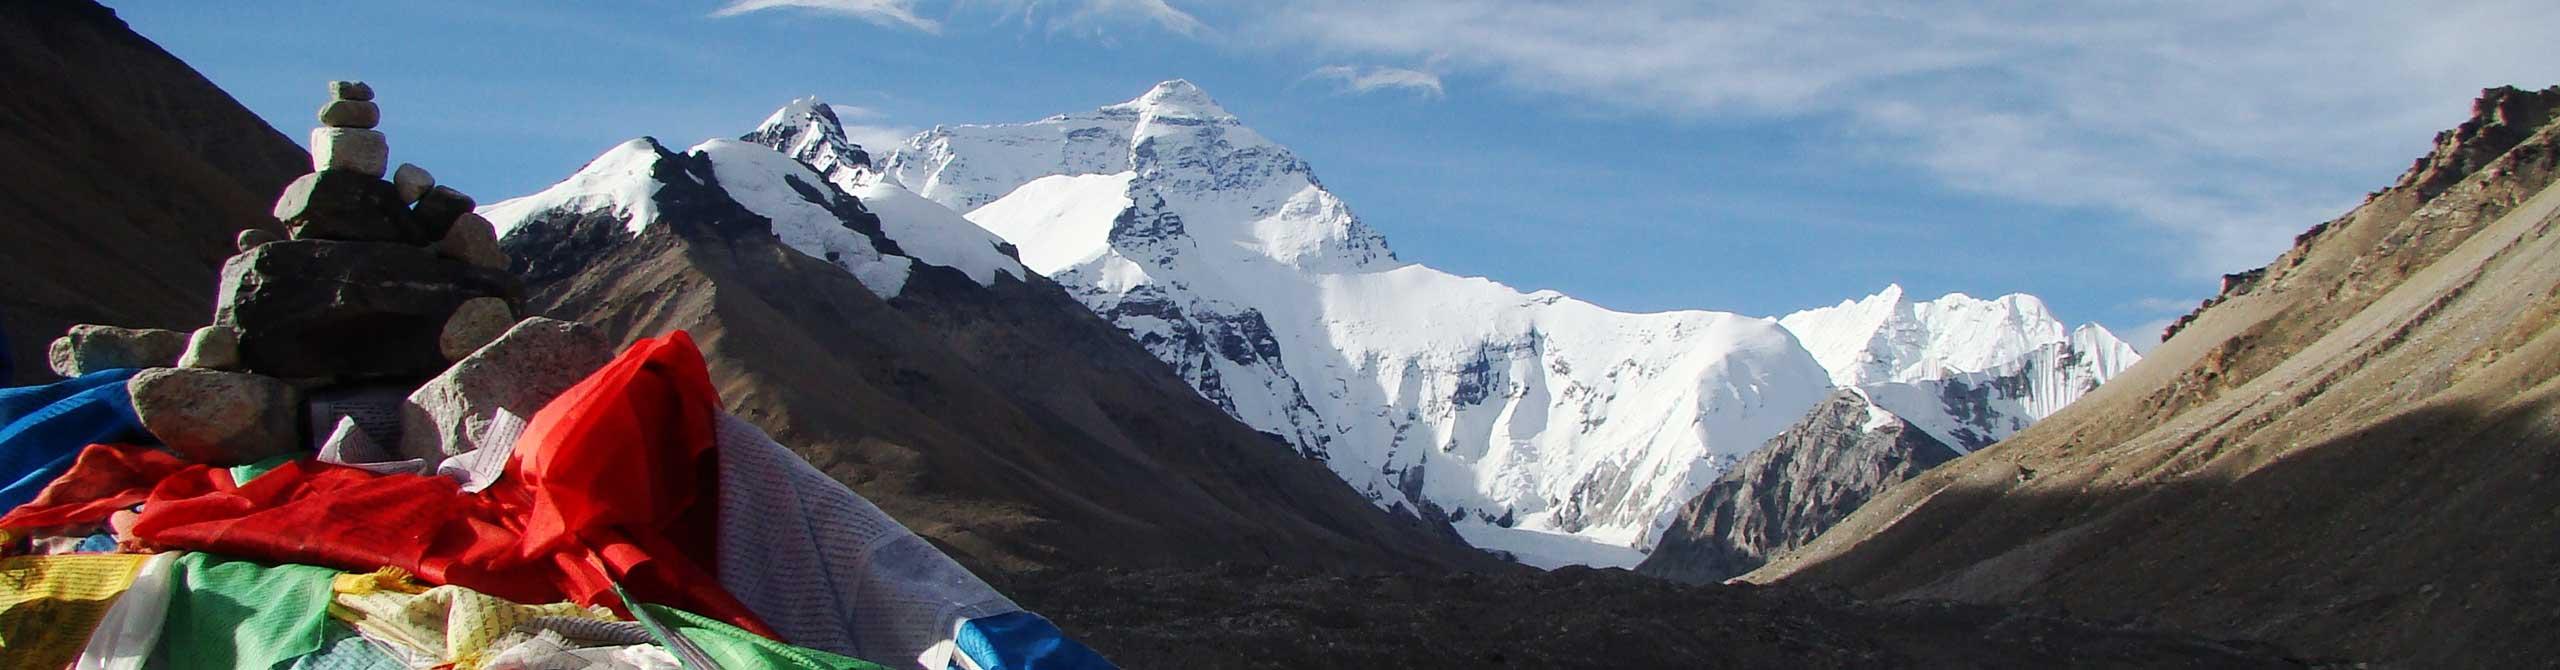 4-Day Mt. Everest Tour